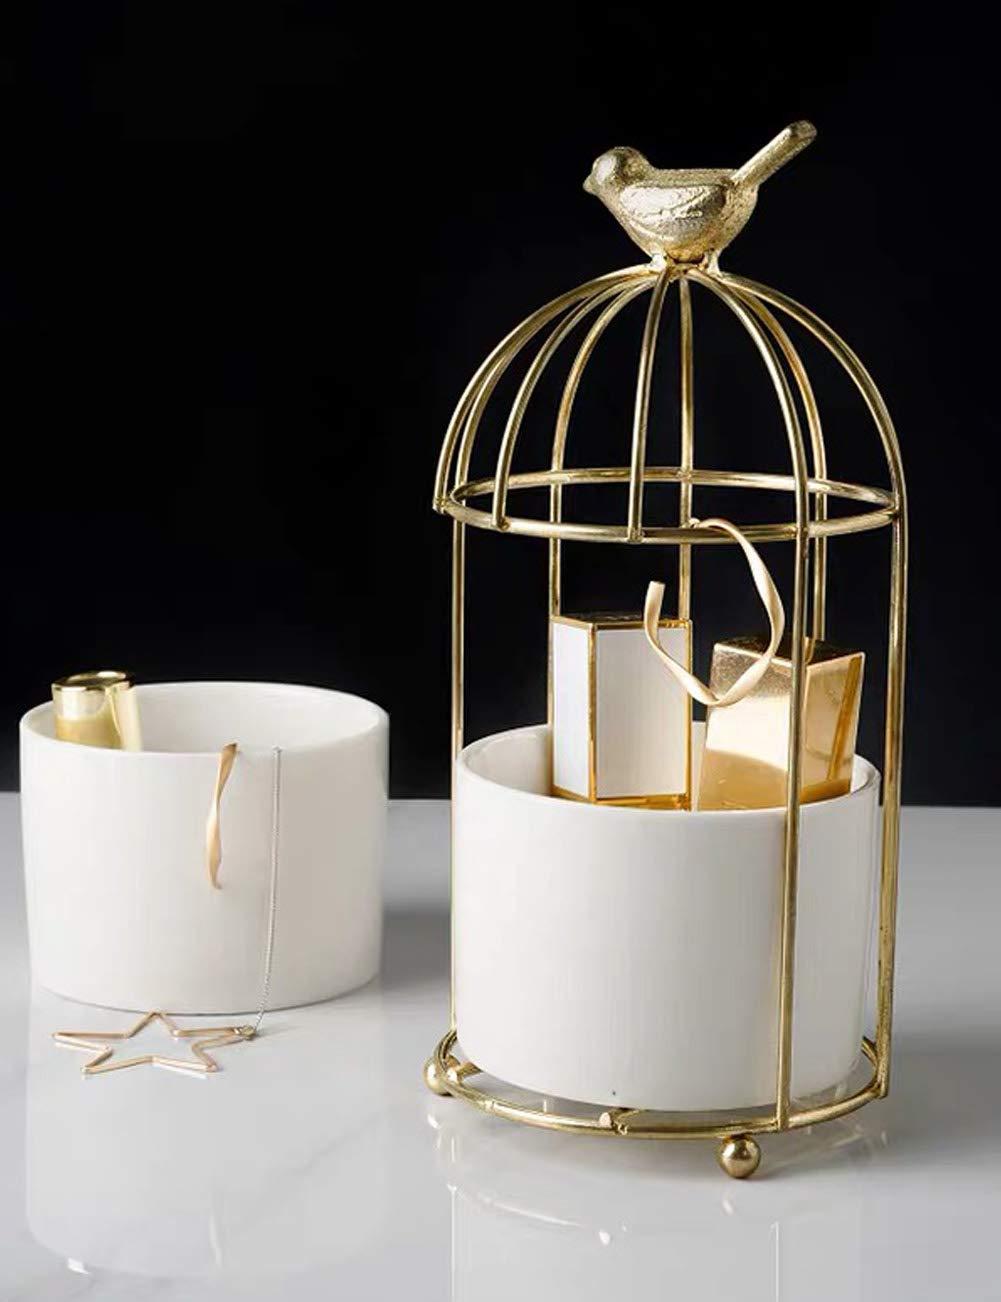 lemonadeus Birdcage Lipstick Organizer Portable Decor Flower Container Display for Wedding (Gold) by lemonadeus